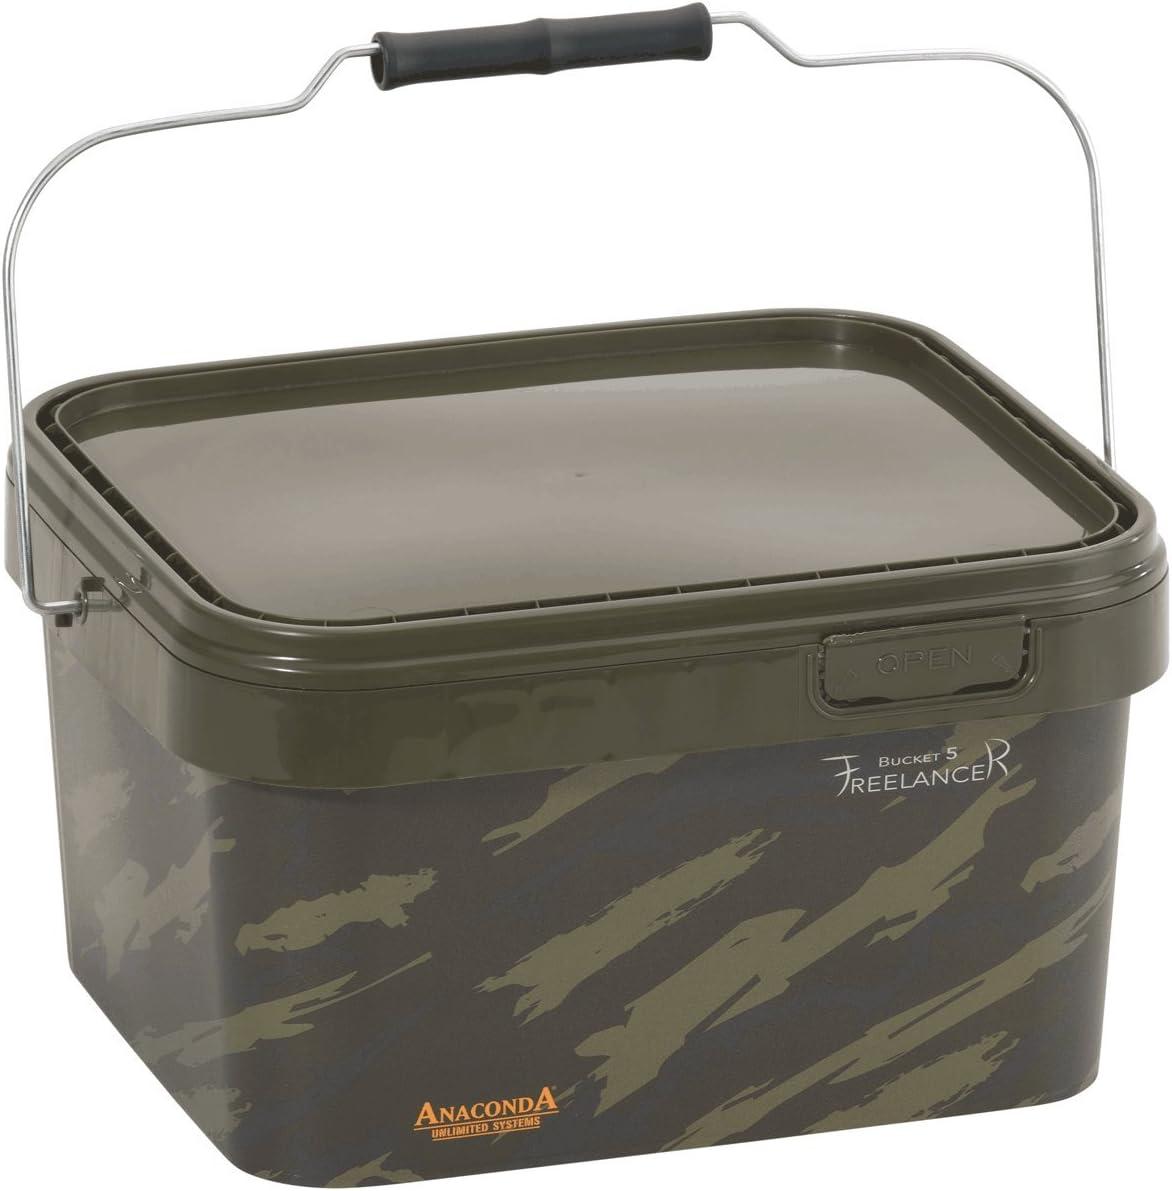 Anaconda Freelancer Bucket 5 l Square